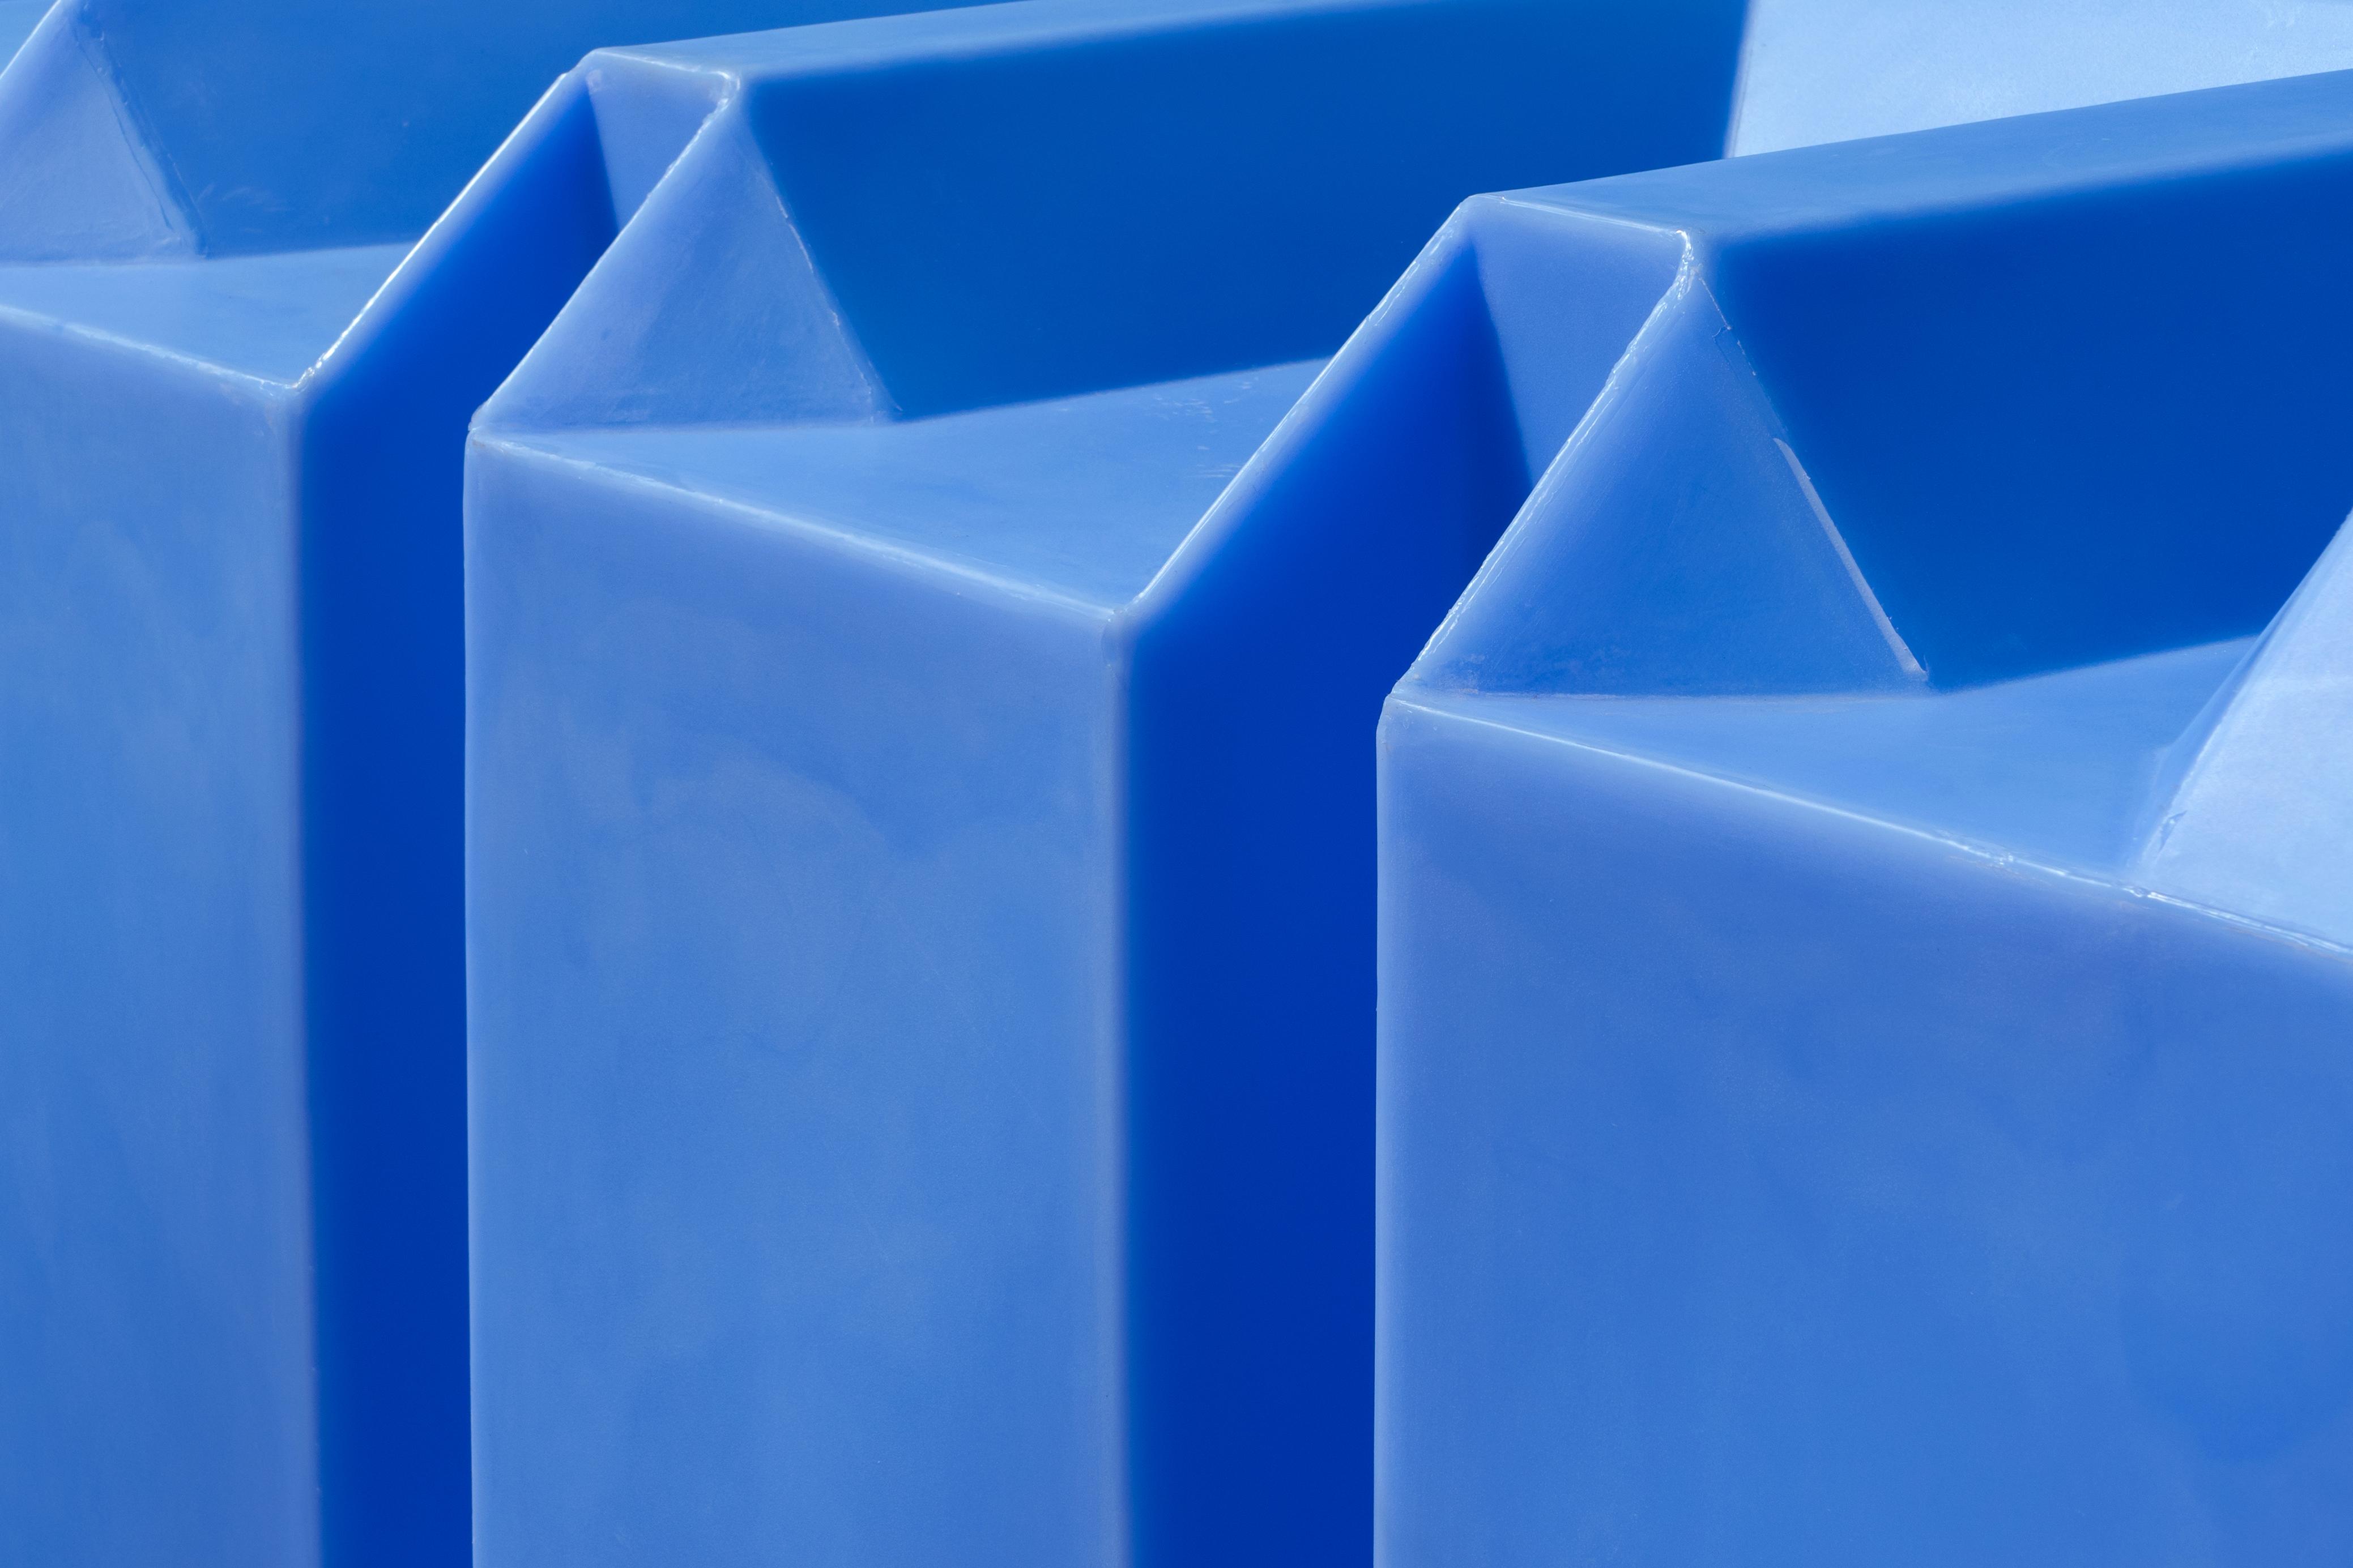 Blue plastic water tank 1, Architecture, Blue, Geometric, Lines, HQ Photo